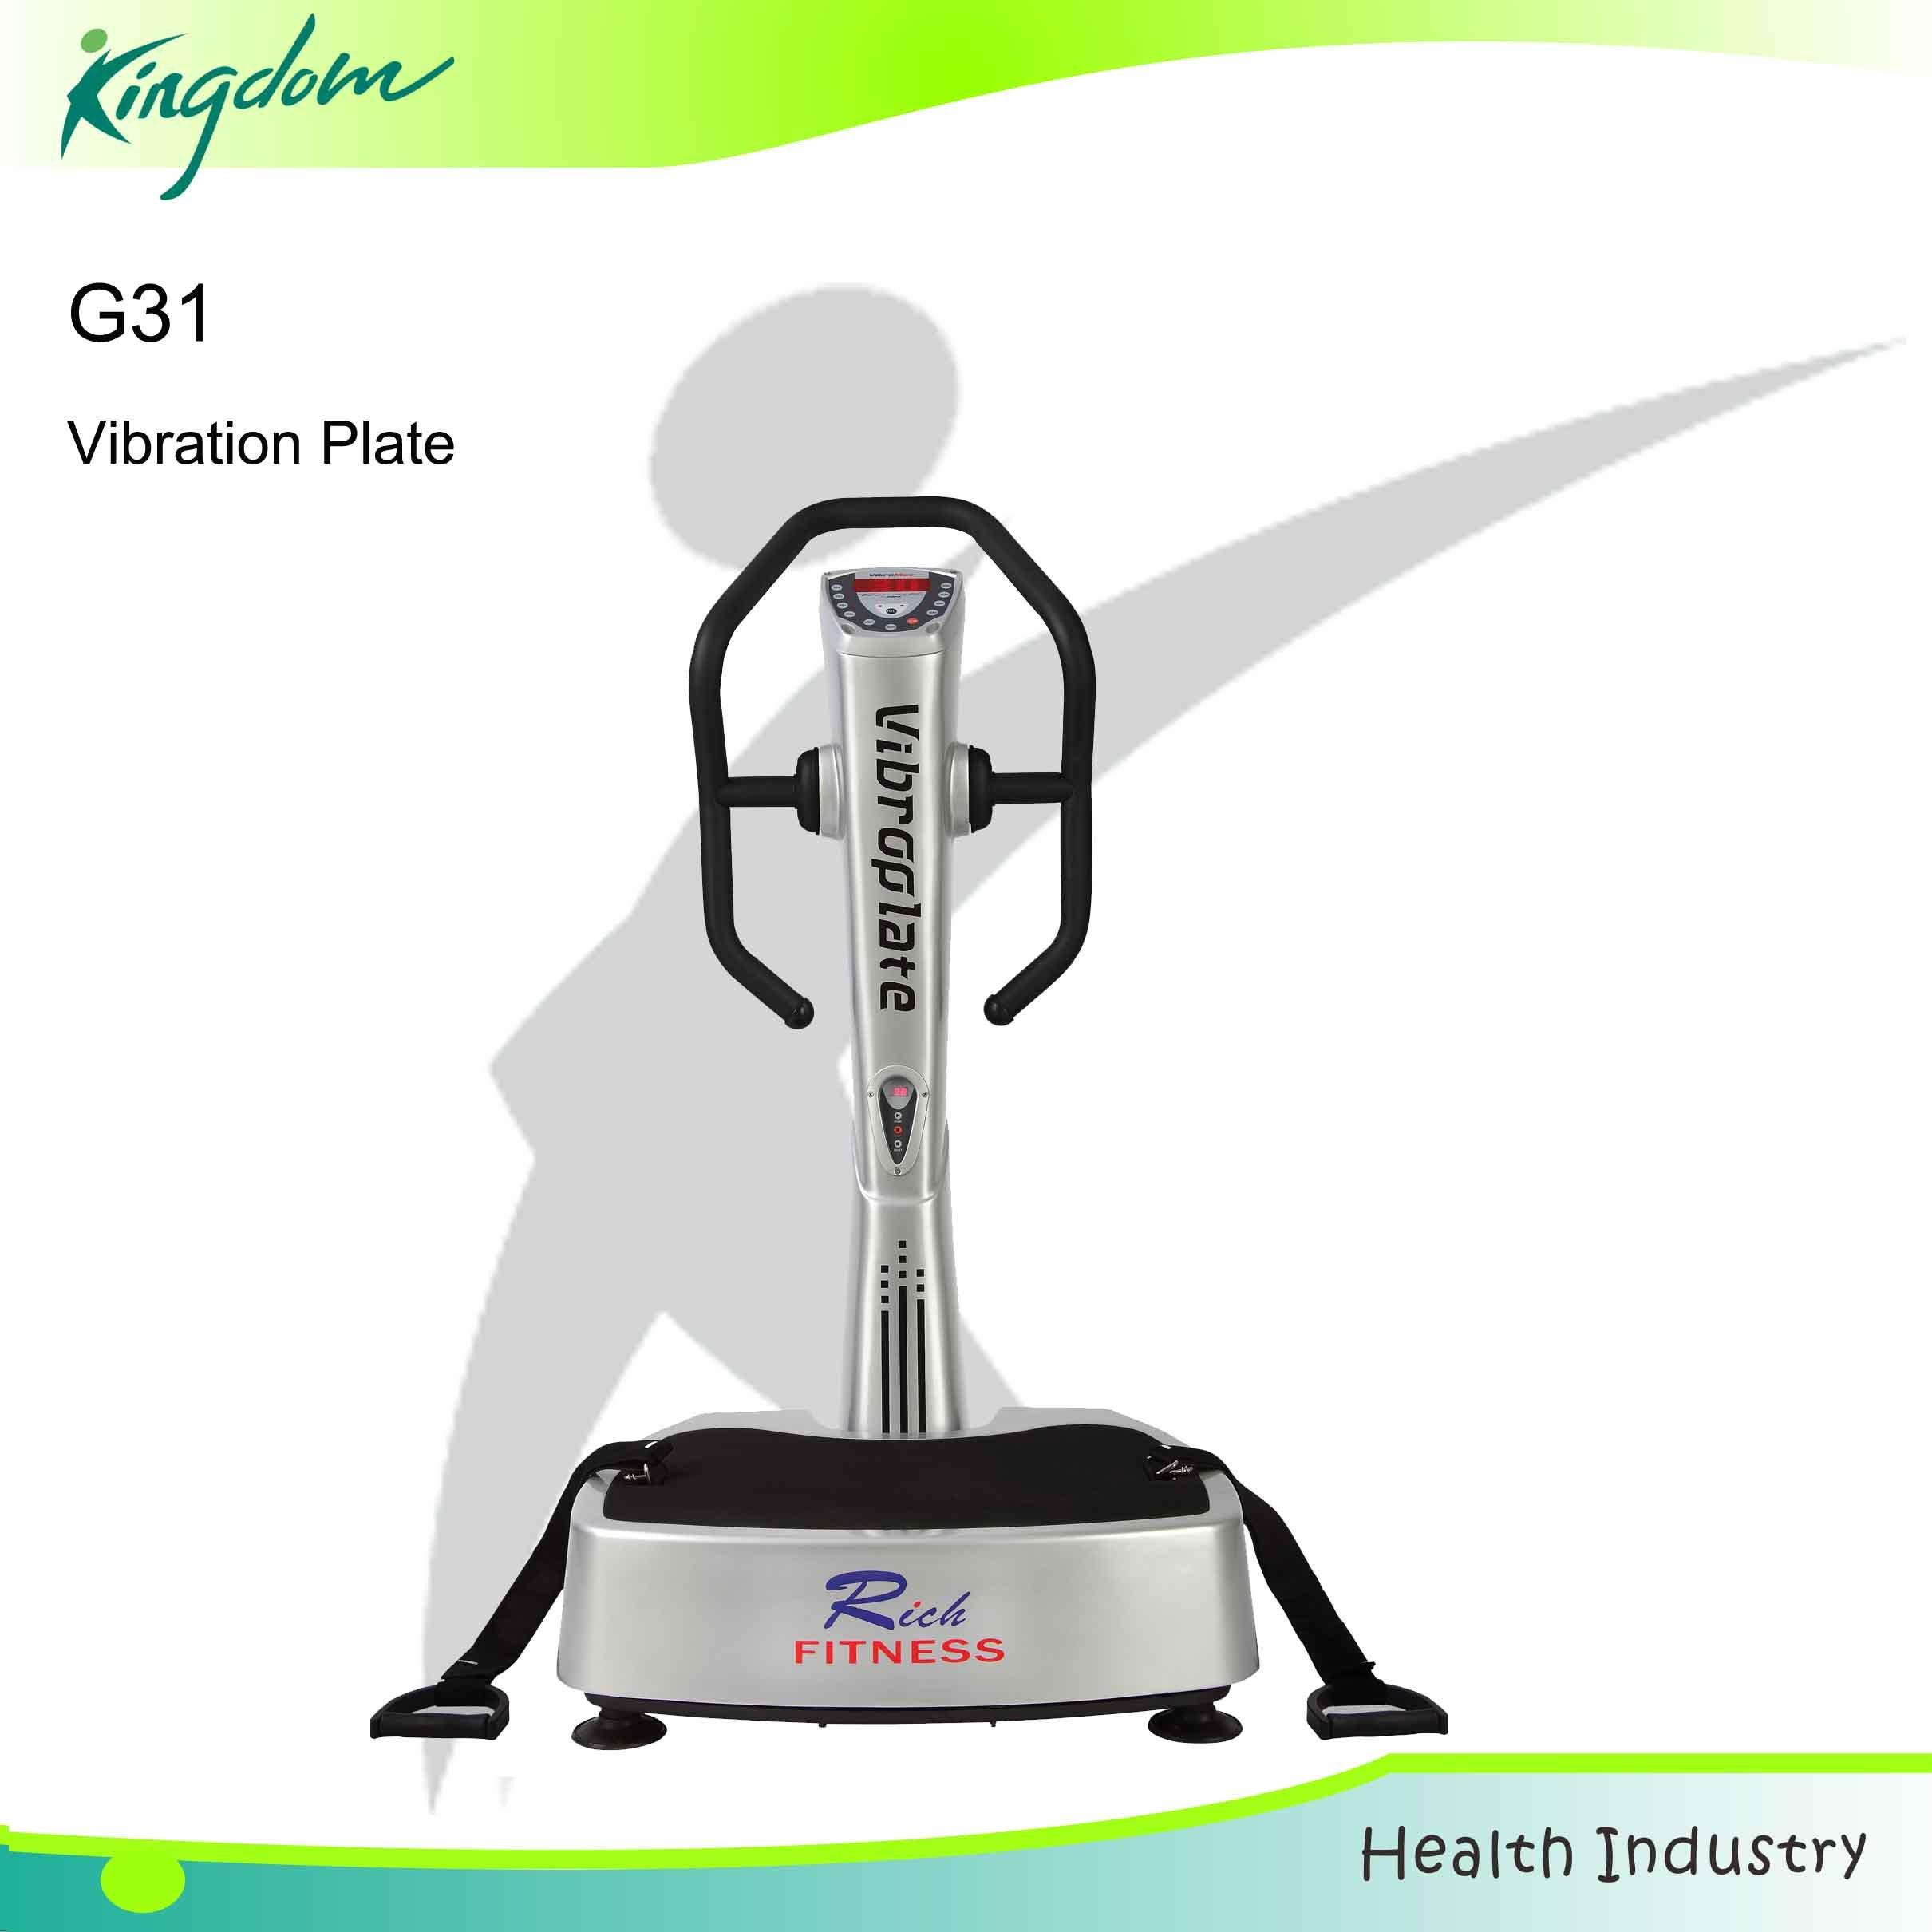 Vibration Plate Crazy Fit Massage Body Buildingtness Equipment Slimming Machine (G31)